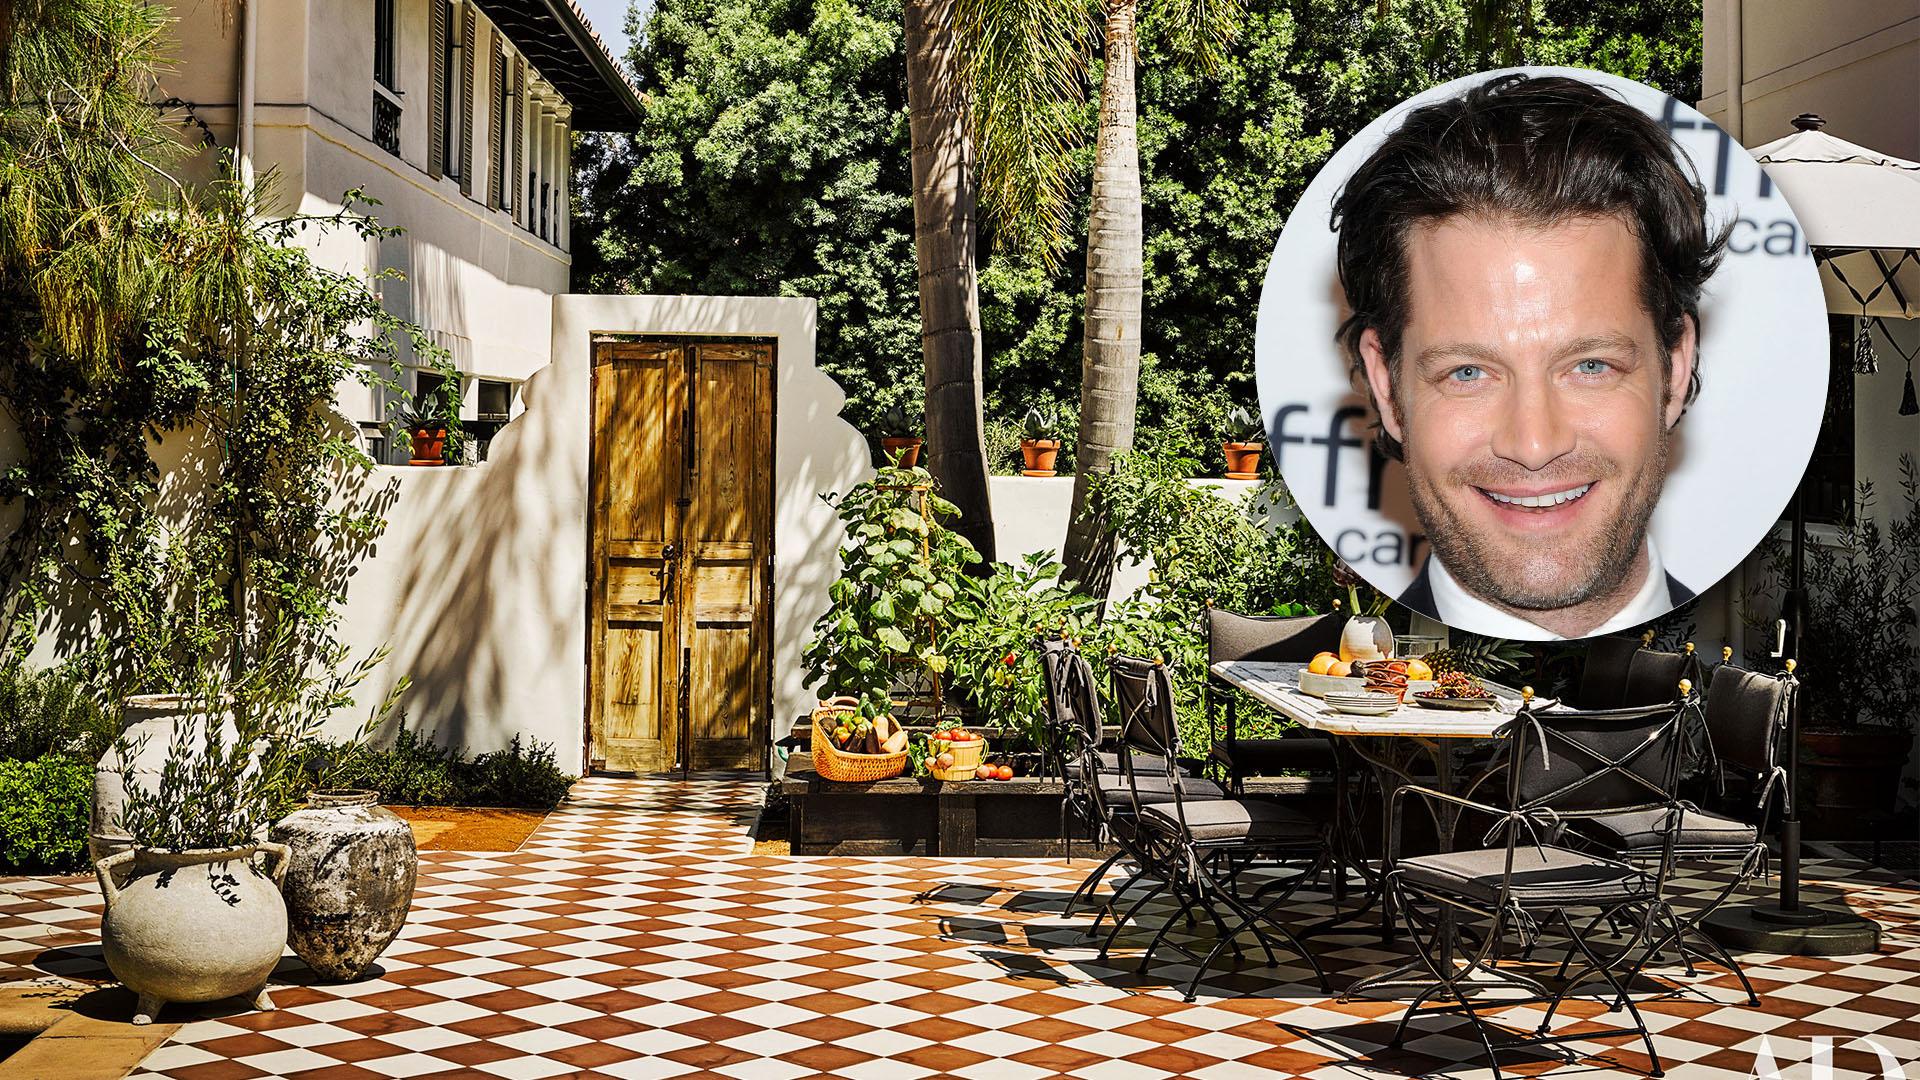 Nate Berkus new Los Angeles home is a designers dream